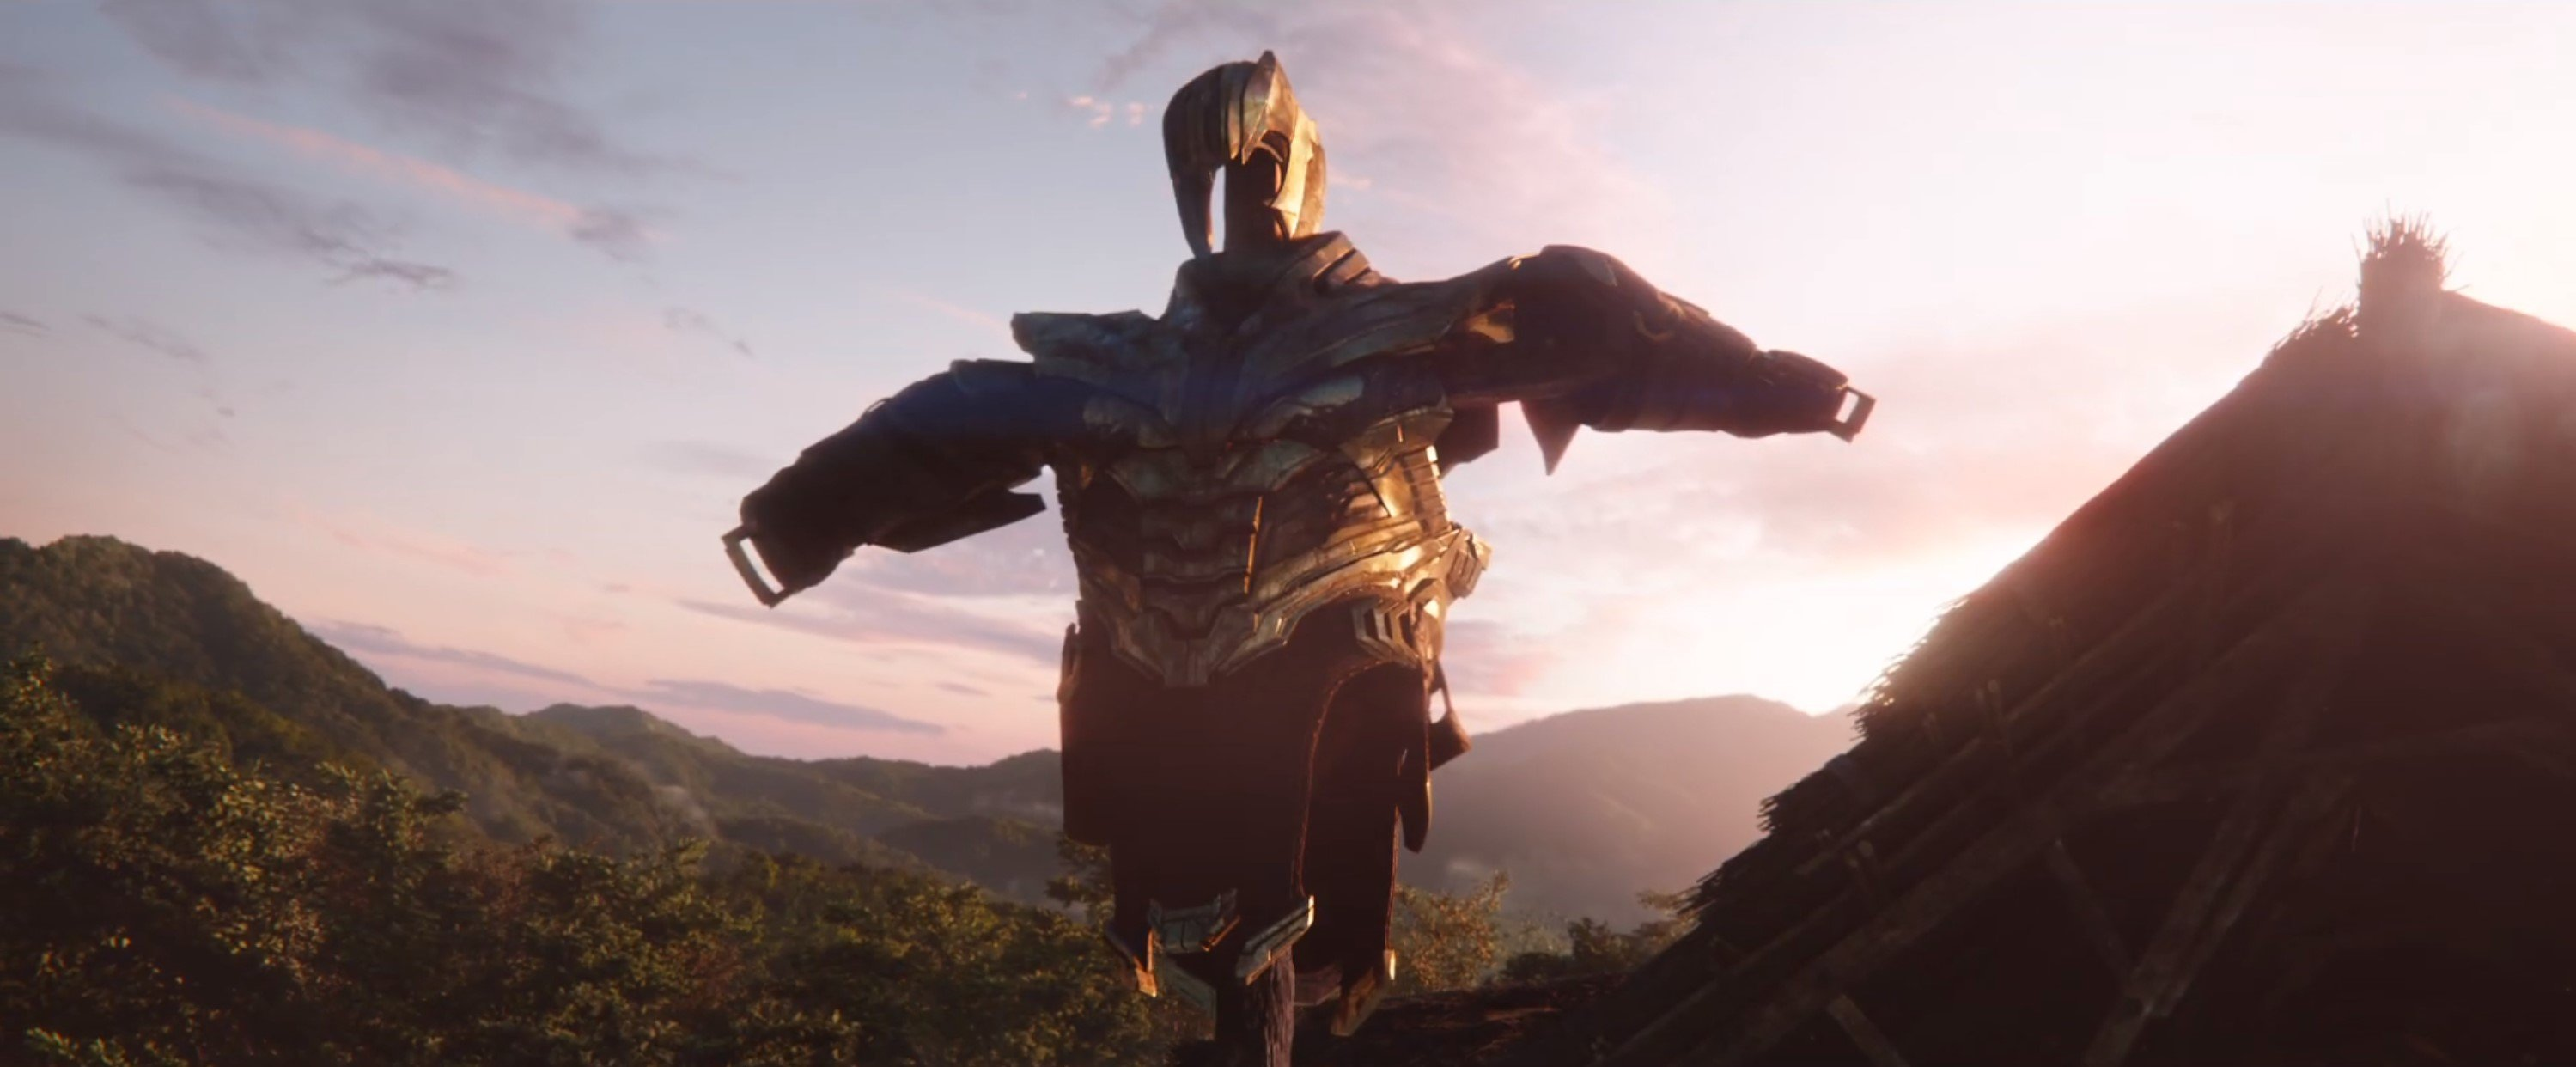 Мстители: Финал. Броня Таноса